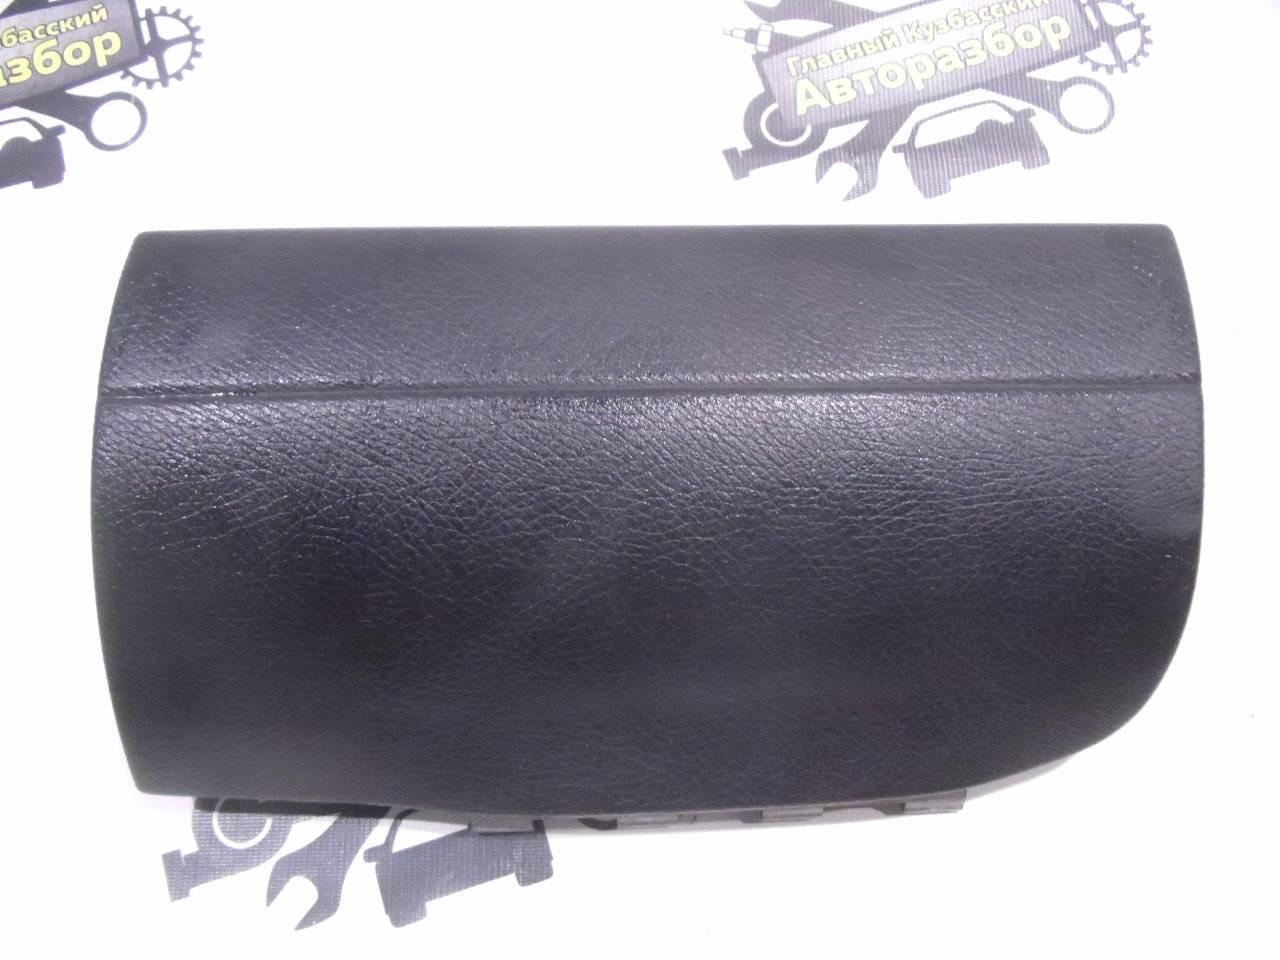 Крышка подушки безопасности (в торпедо) Opel Omega 26 X25XE 1994